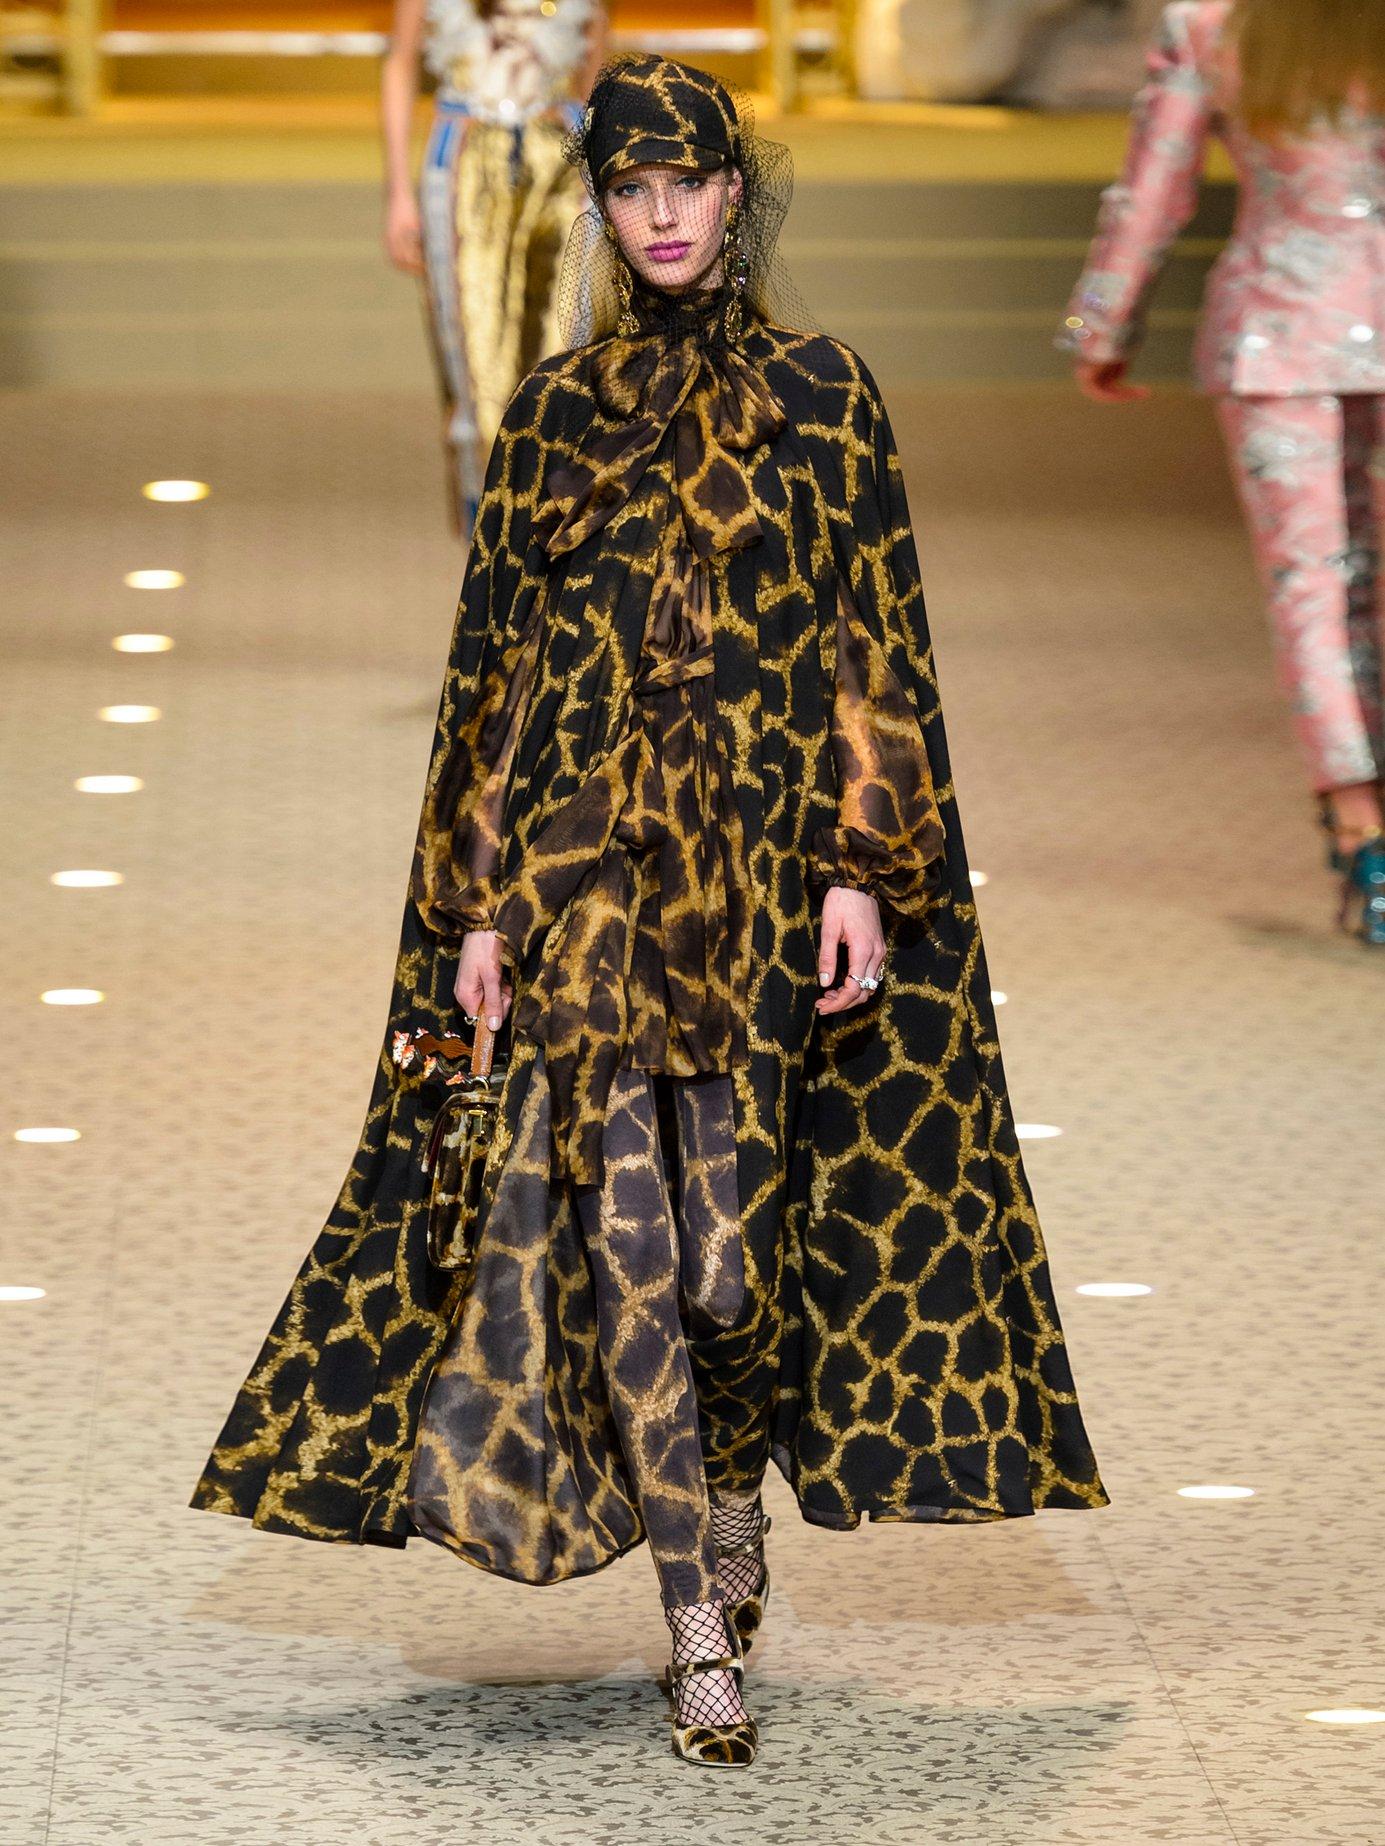 Giraffe-print tie-neck dress by Dolce & Gabbana